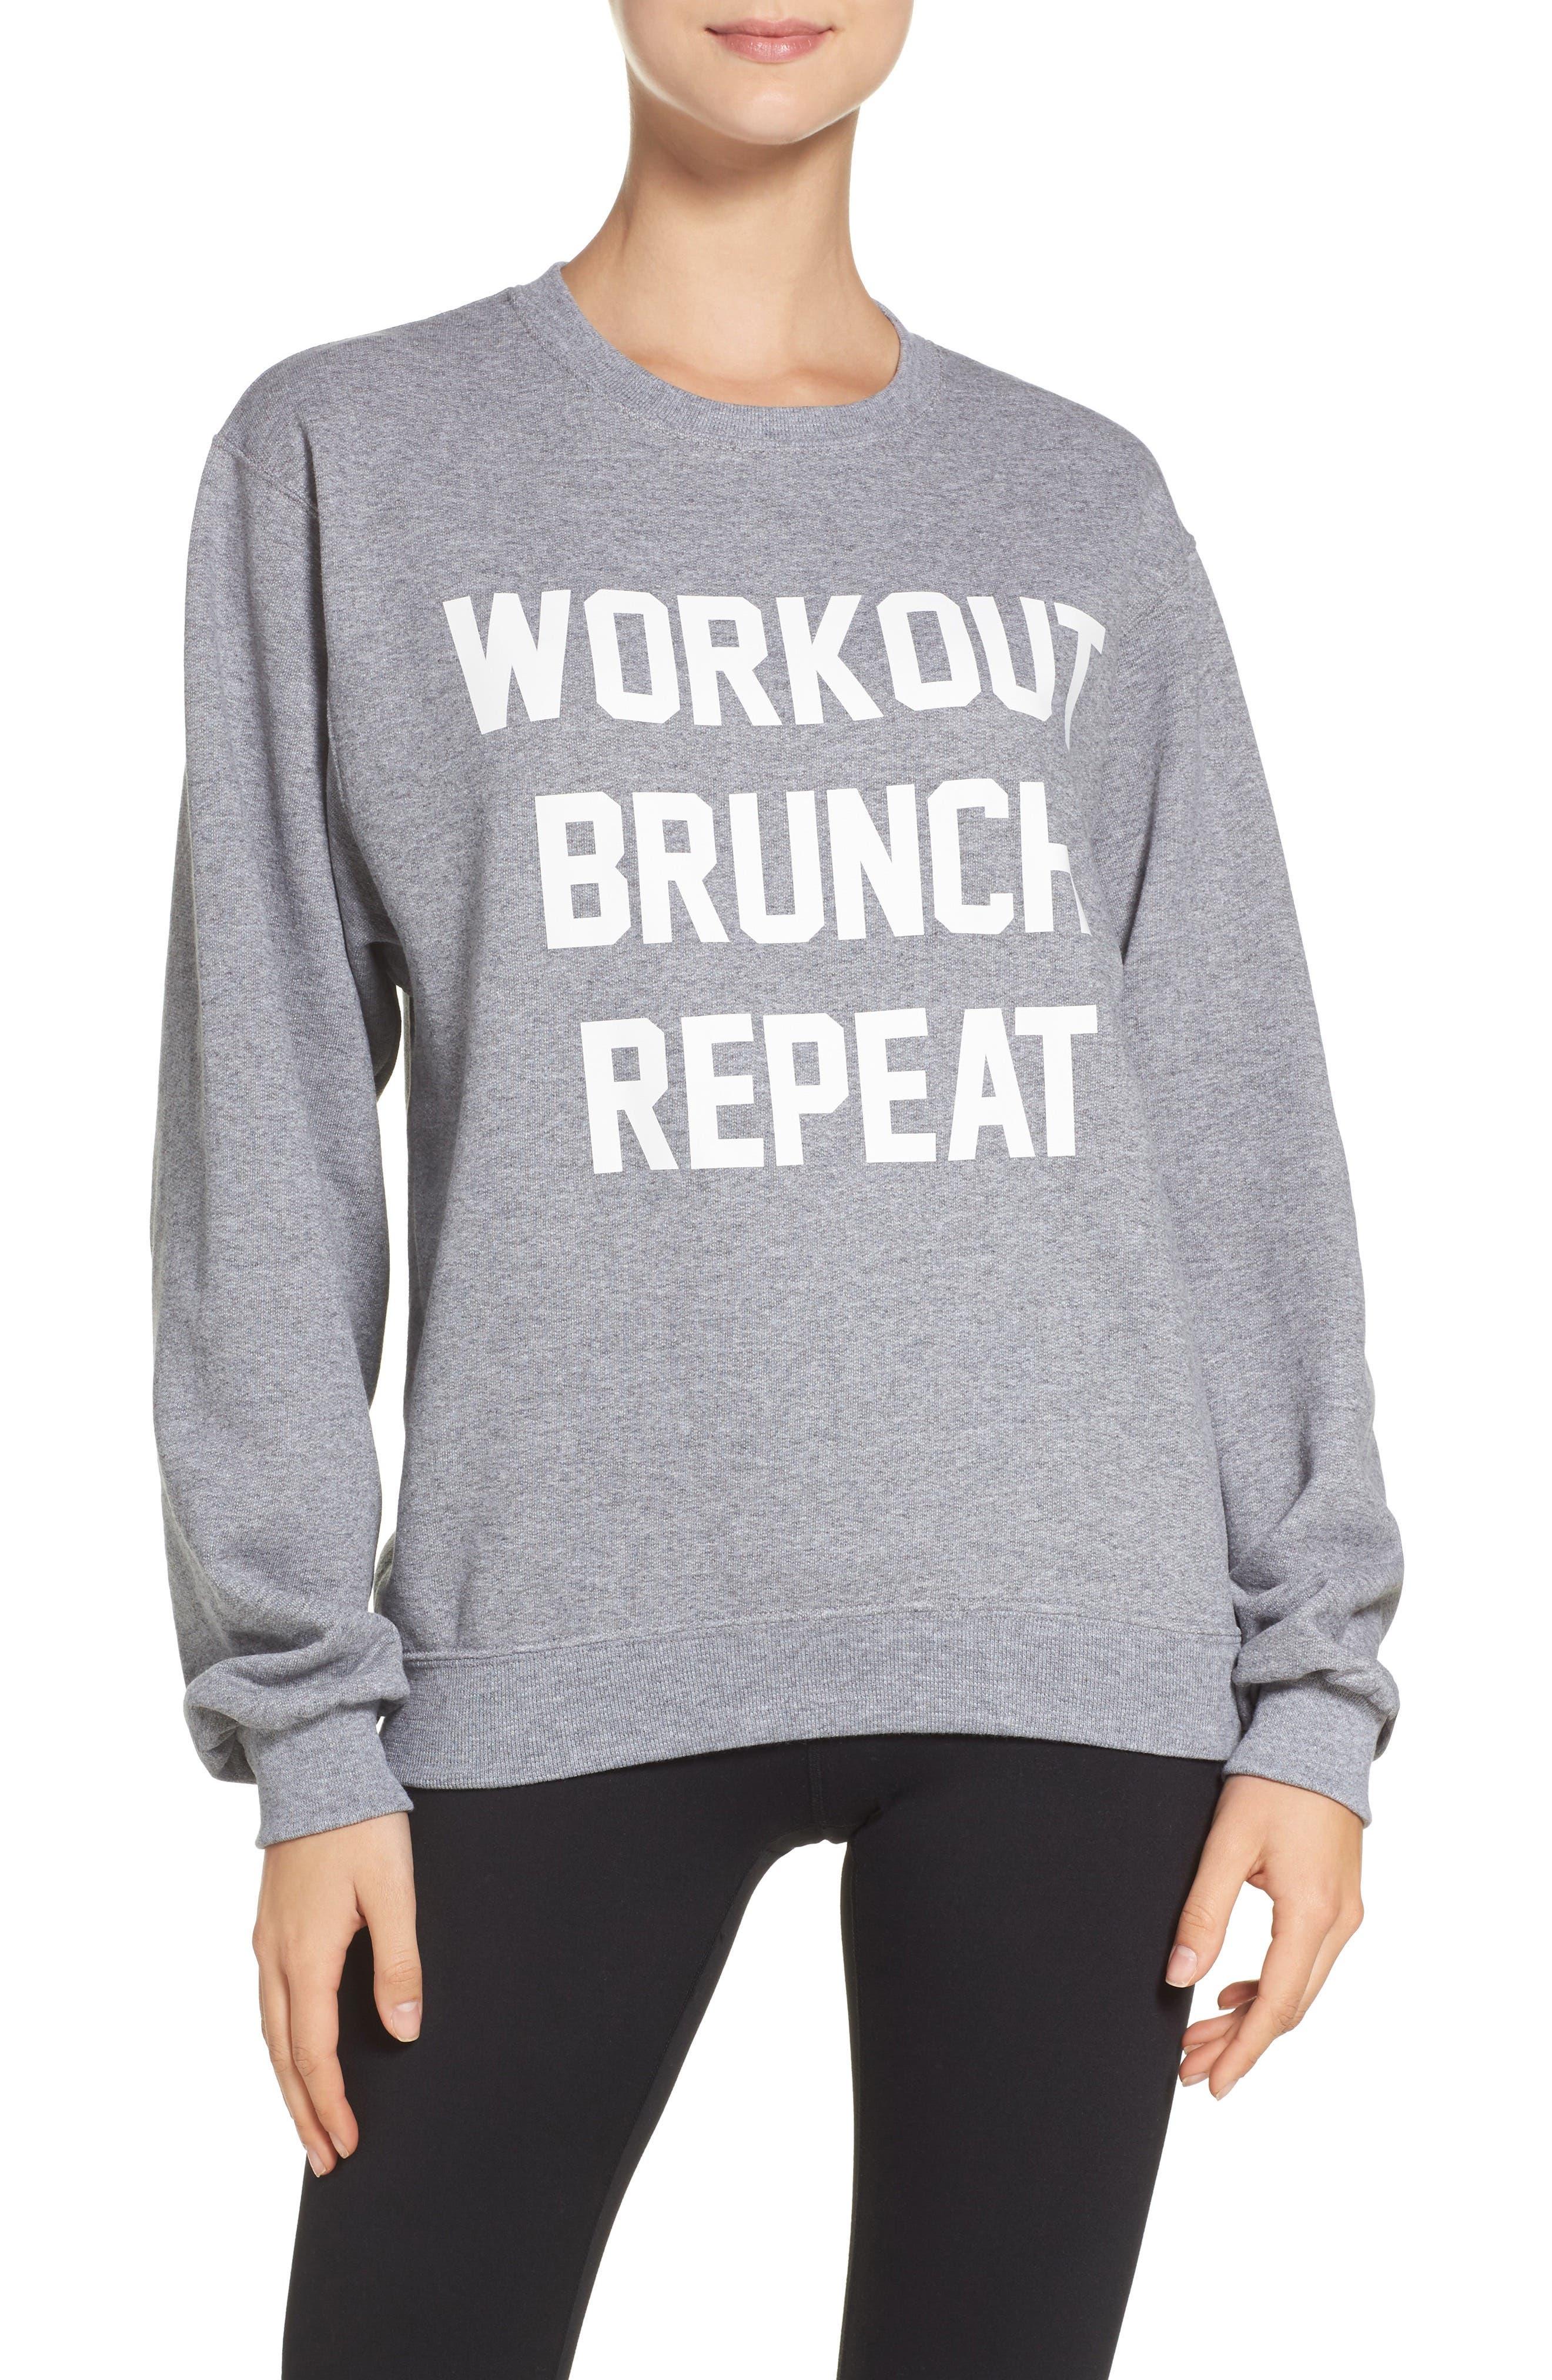 Workout Brunch Repeat Sweatshirt,                             Main thumbnail 1, color,                             020